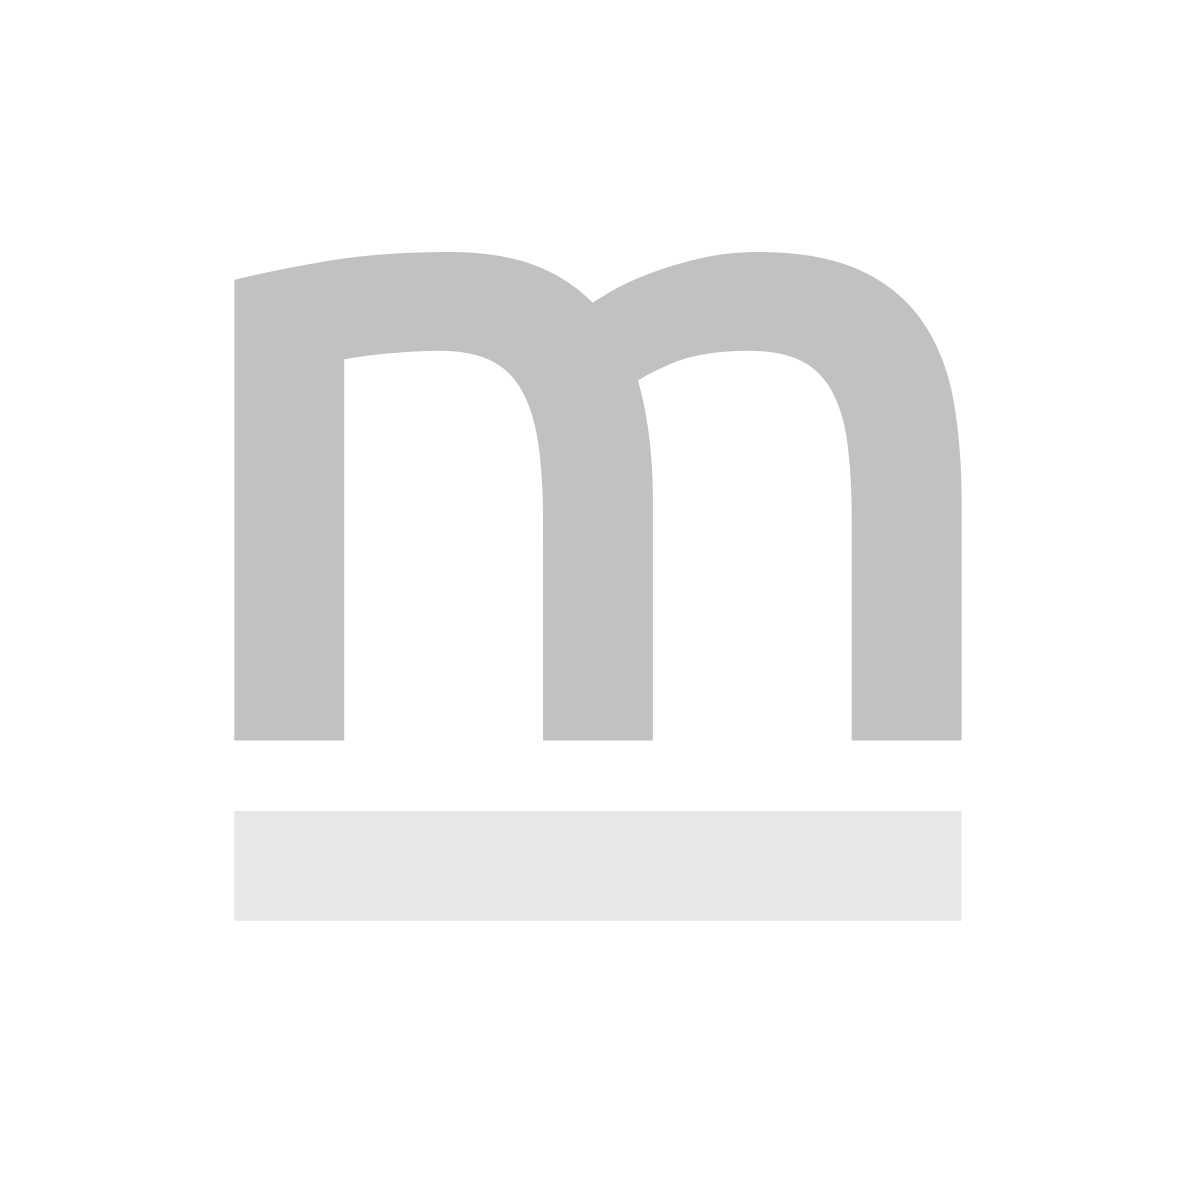 Zegar ścienny Mega Kwadrat 2851